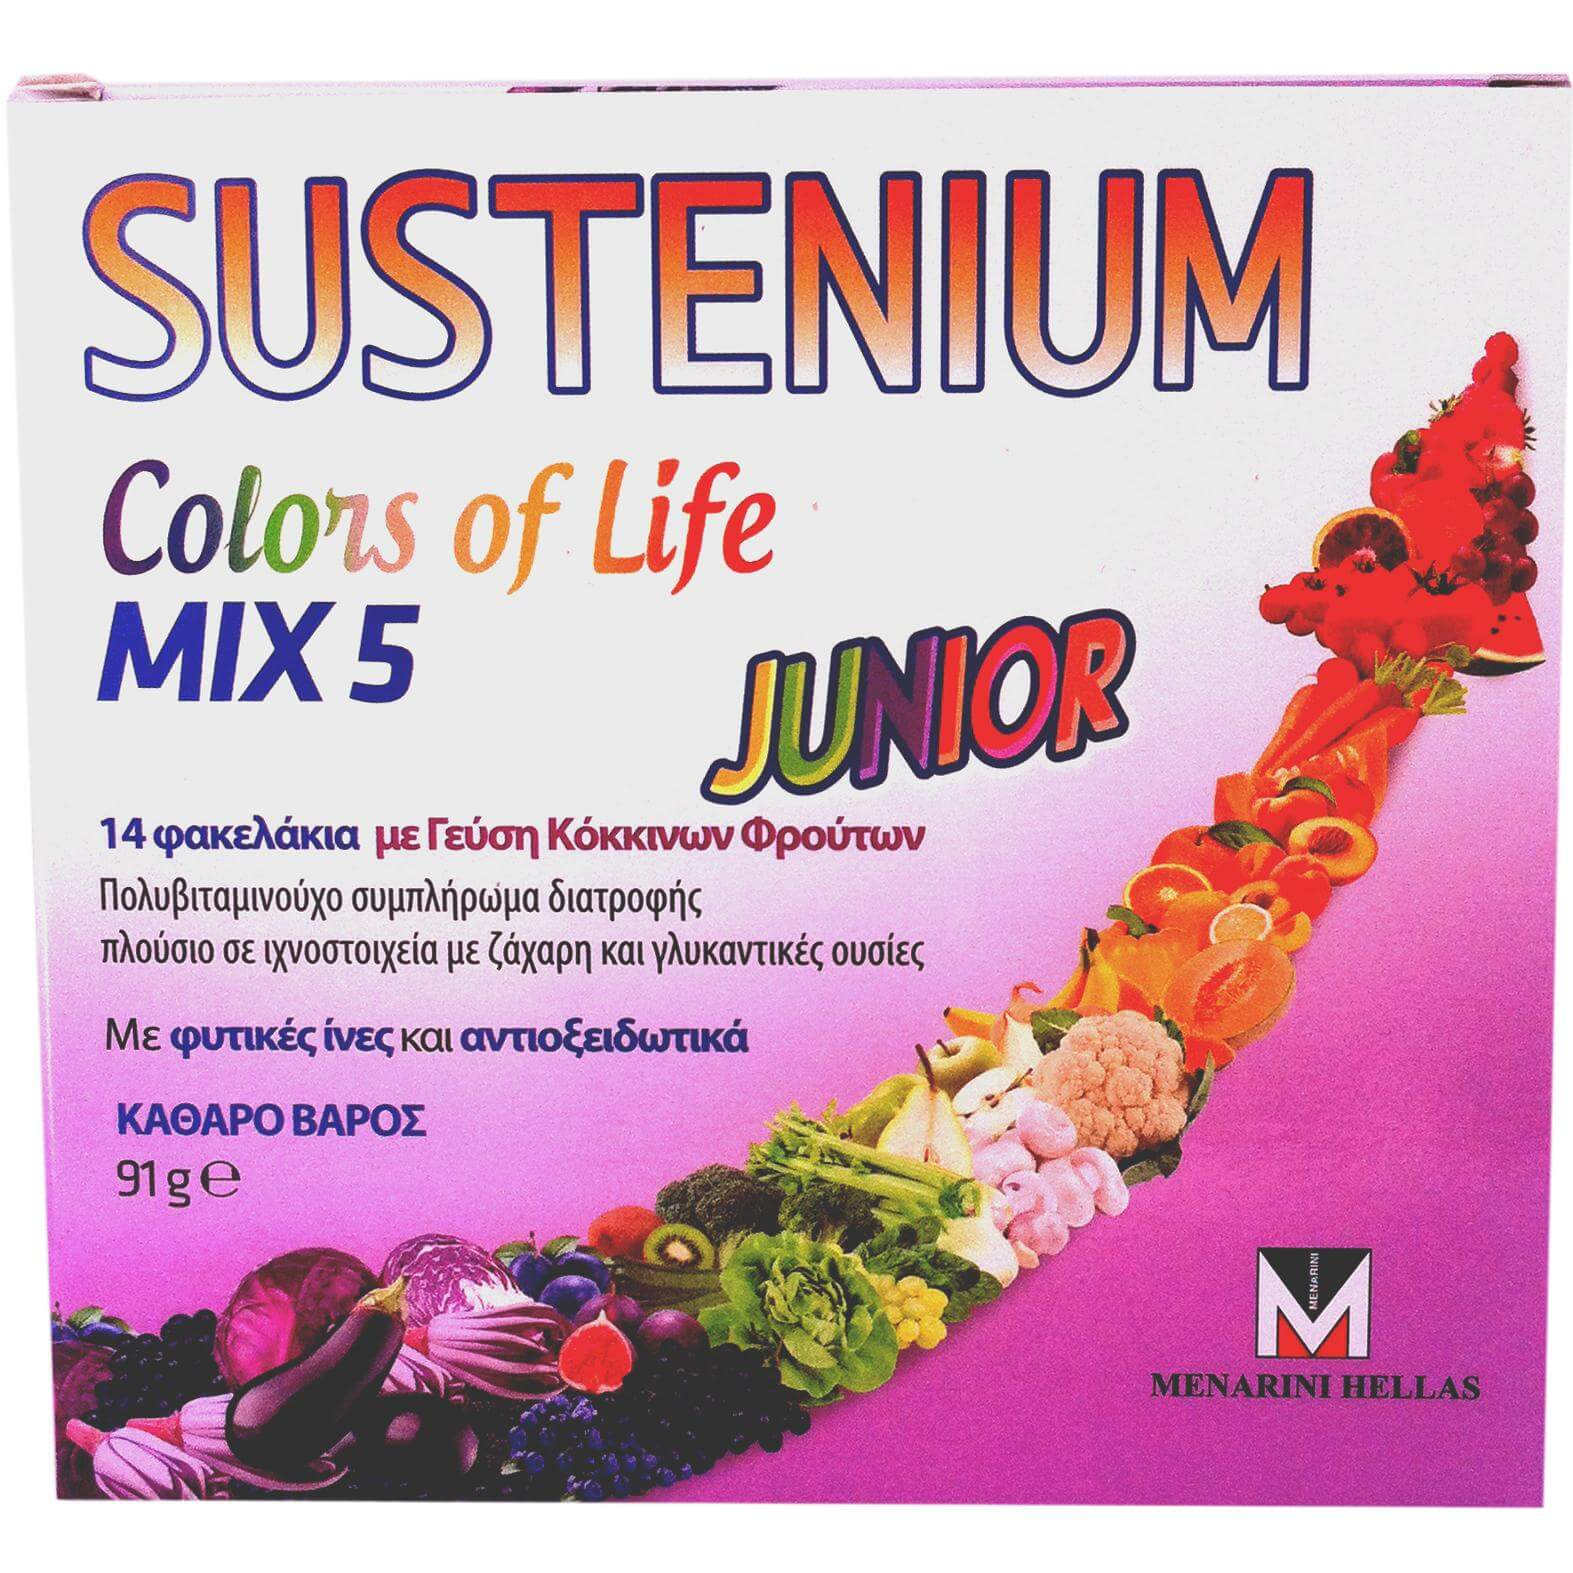 Menarini Sustenium Colors of Life Mix5 Junior Πολυβιταμινούχο Συμπλήρωμα Διατροφής με Φυτικές Ίνες & Αντιοξειδωτικά 14Sachets